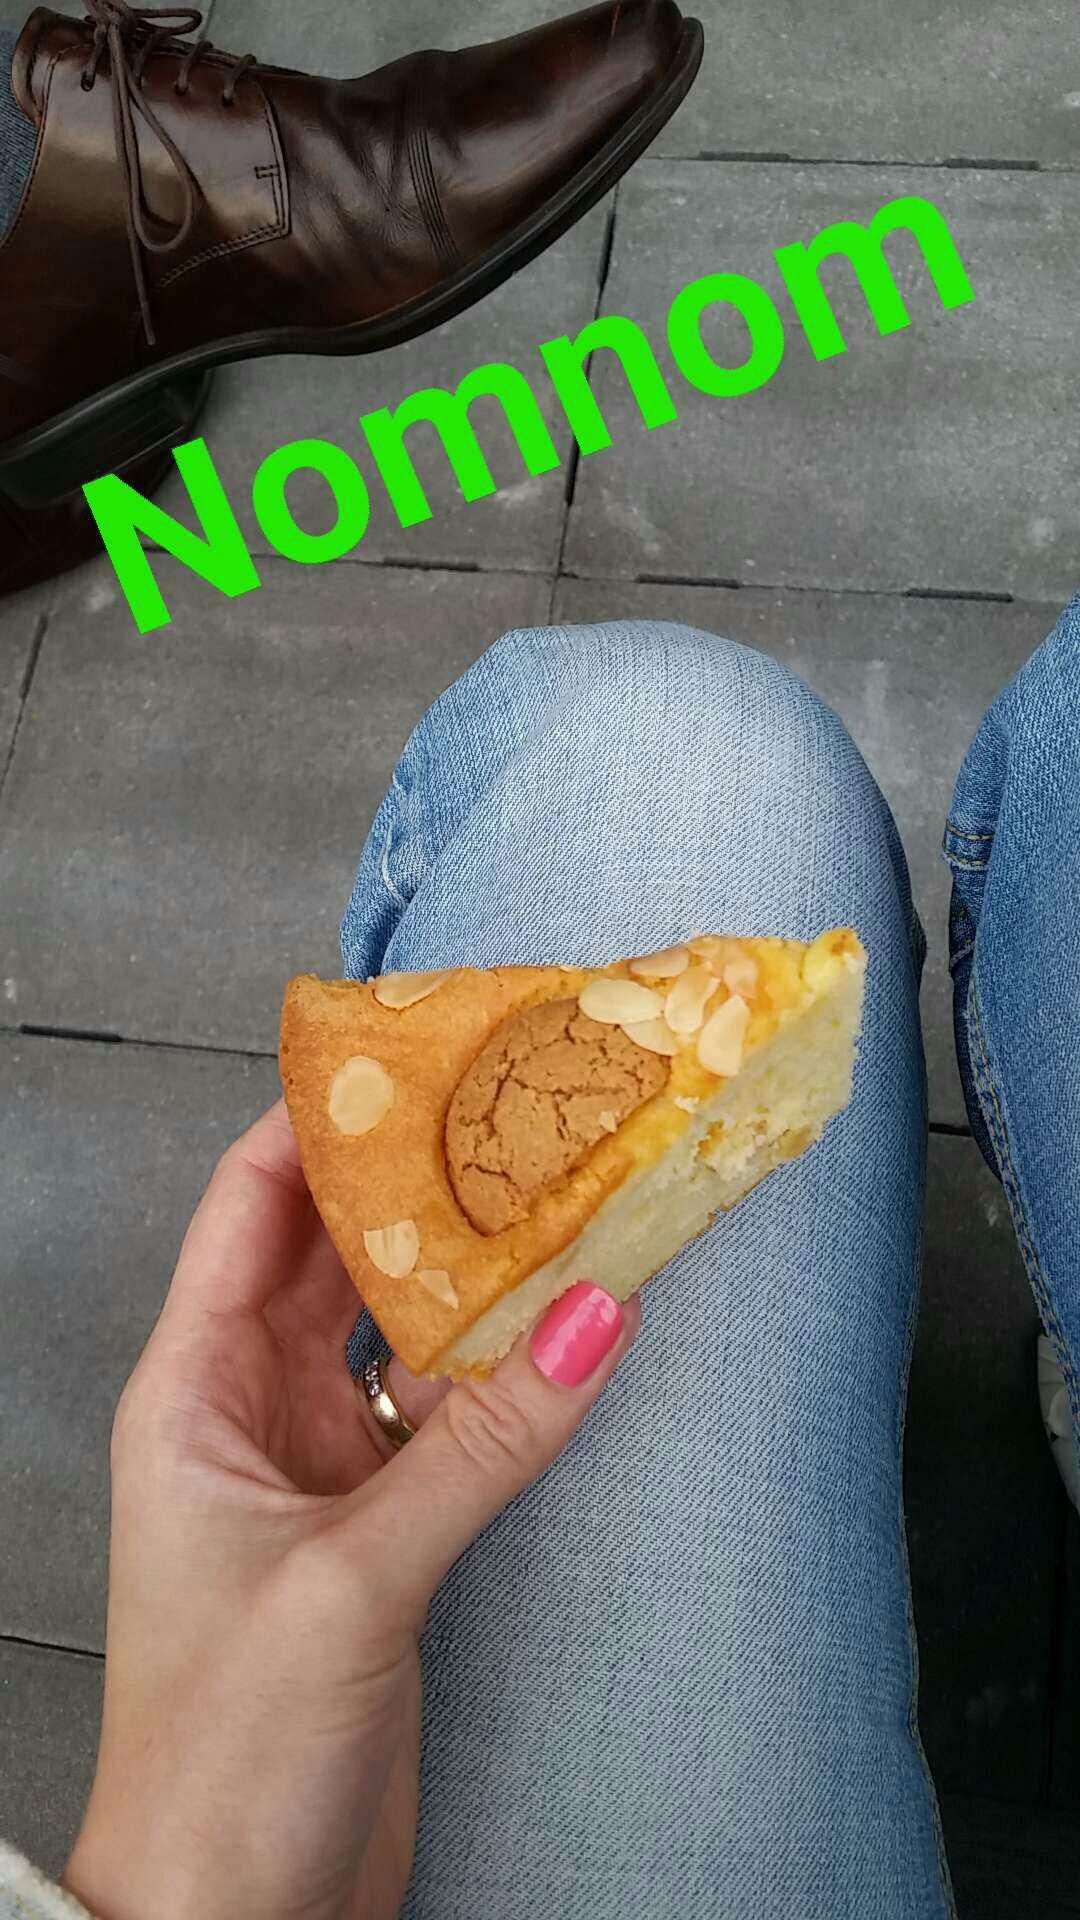 Snapchat nomnom taart